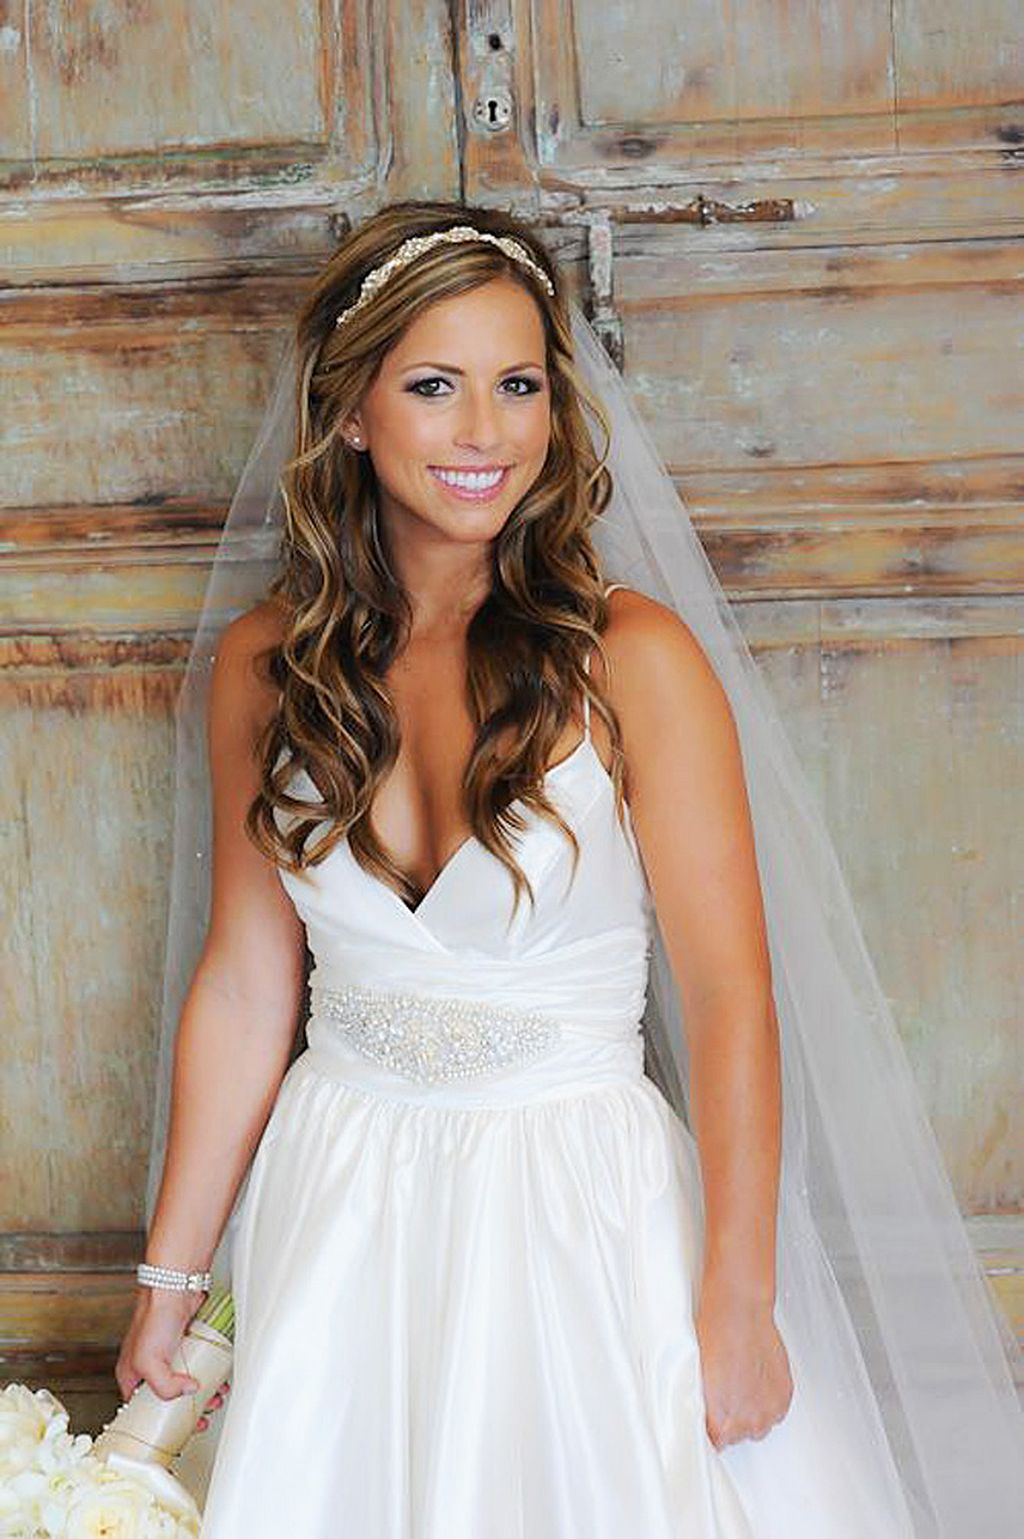 40 beautiful wedding hairdown style with headband ideas 28 in 2019 | Wedding hairstyles, Bride ...